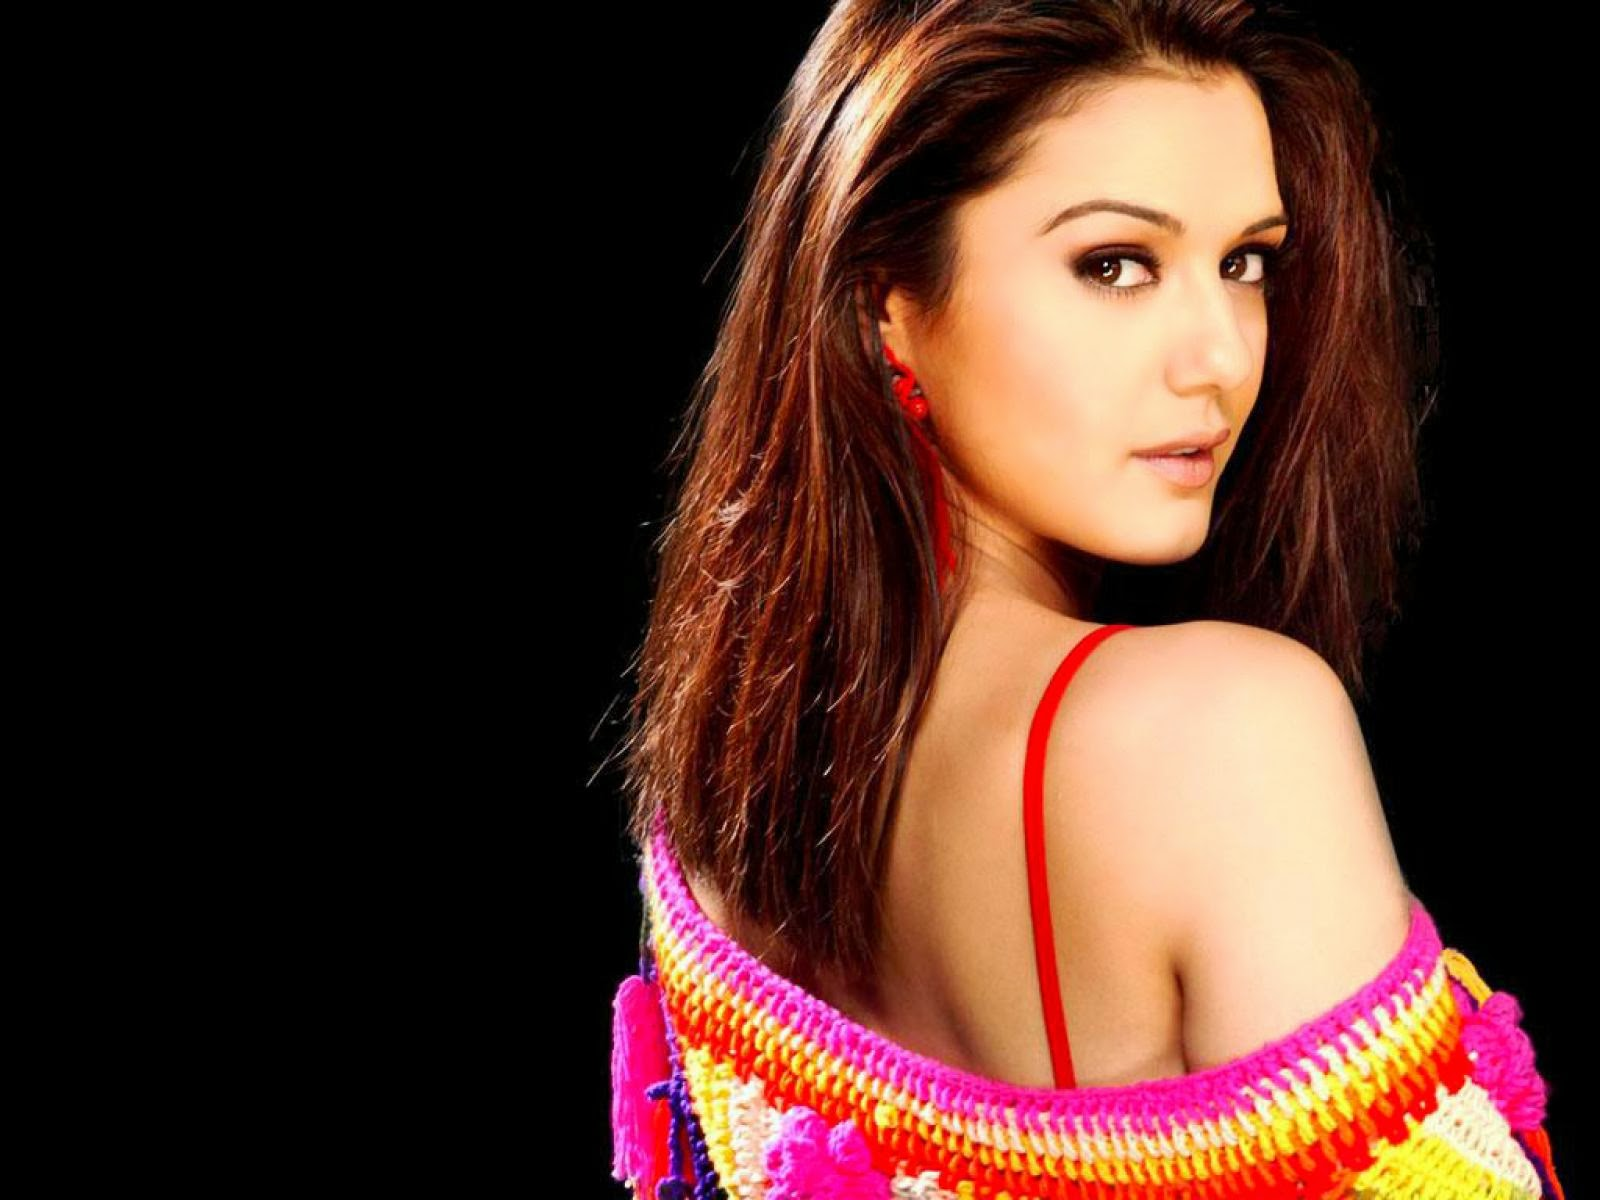 hot girl wallpaper: preity zinta hd wallpaper free download